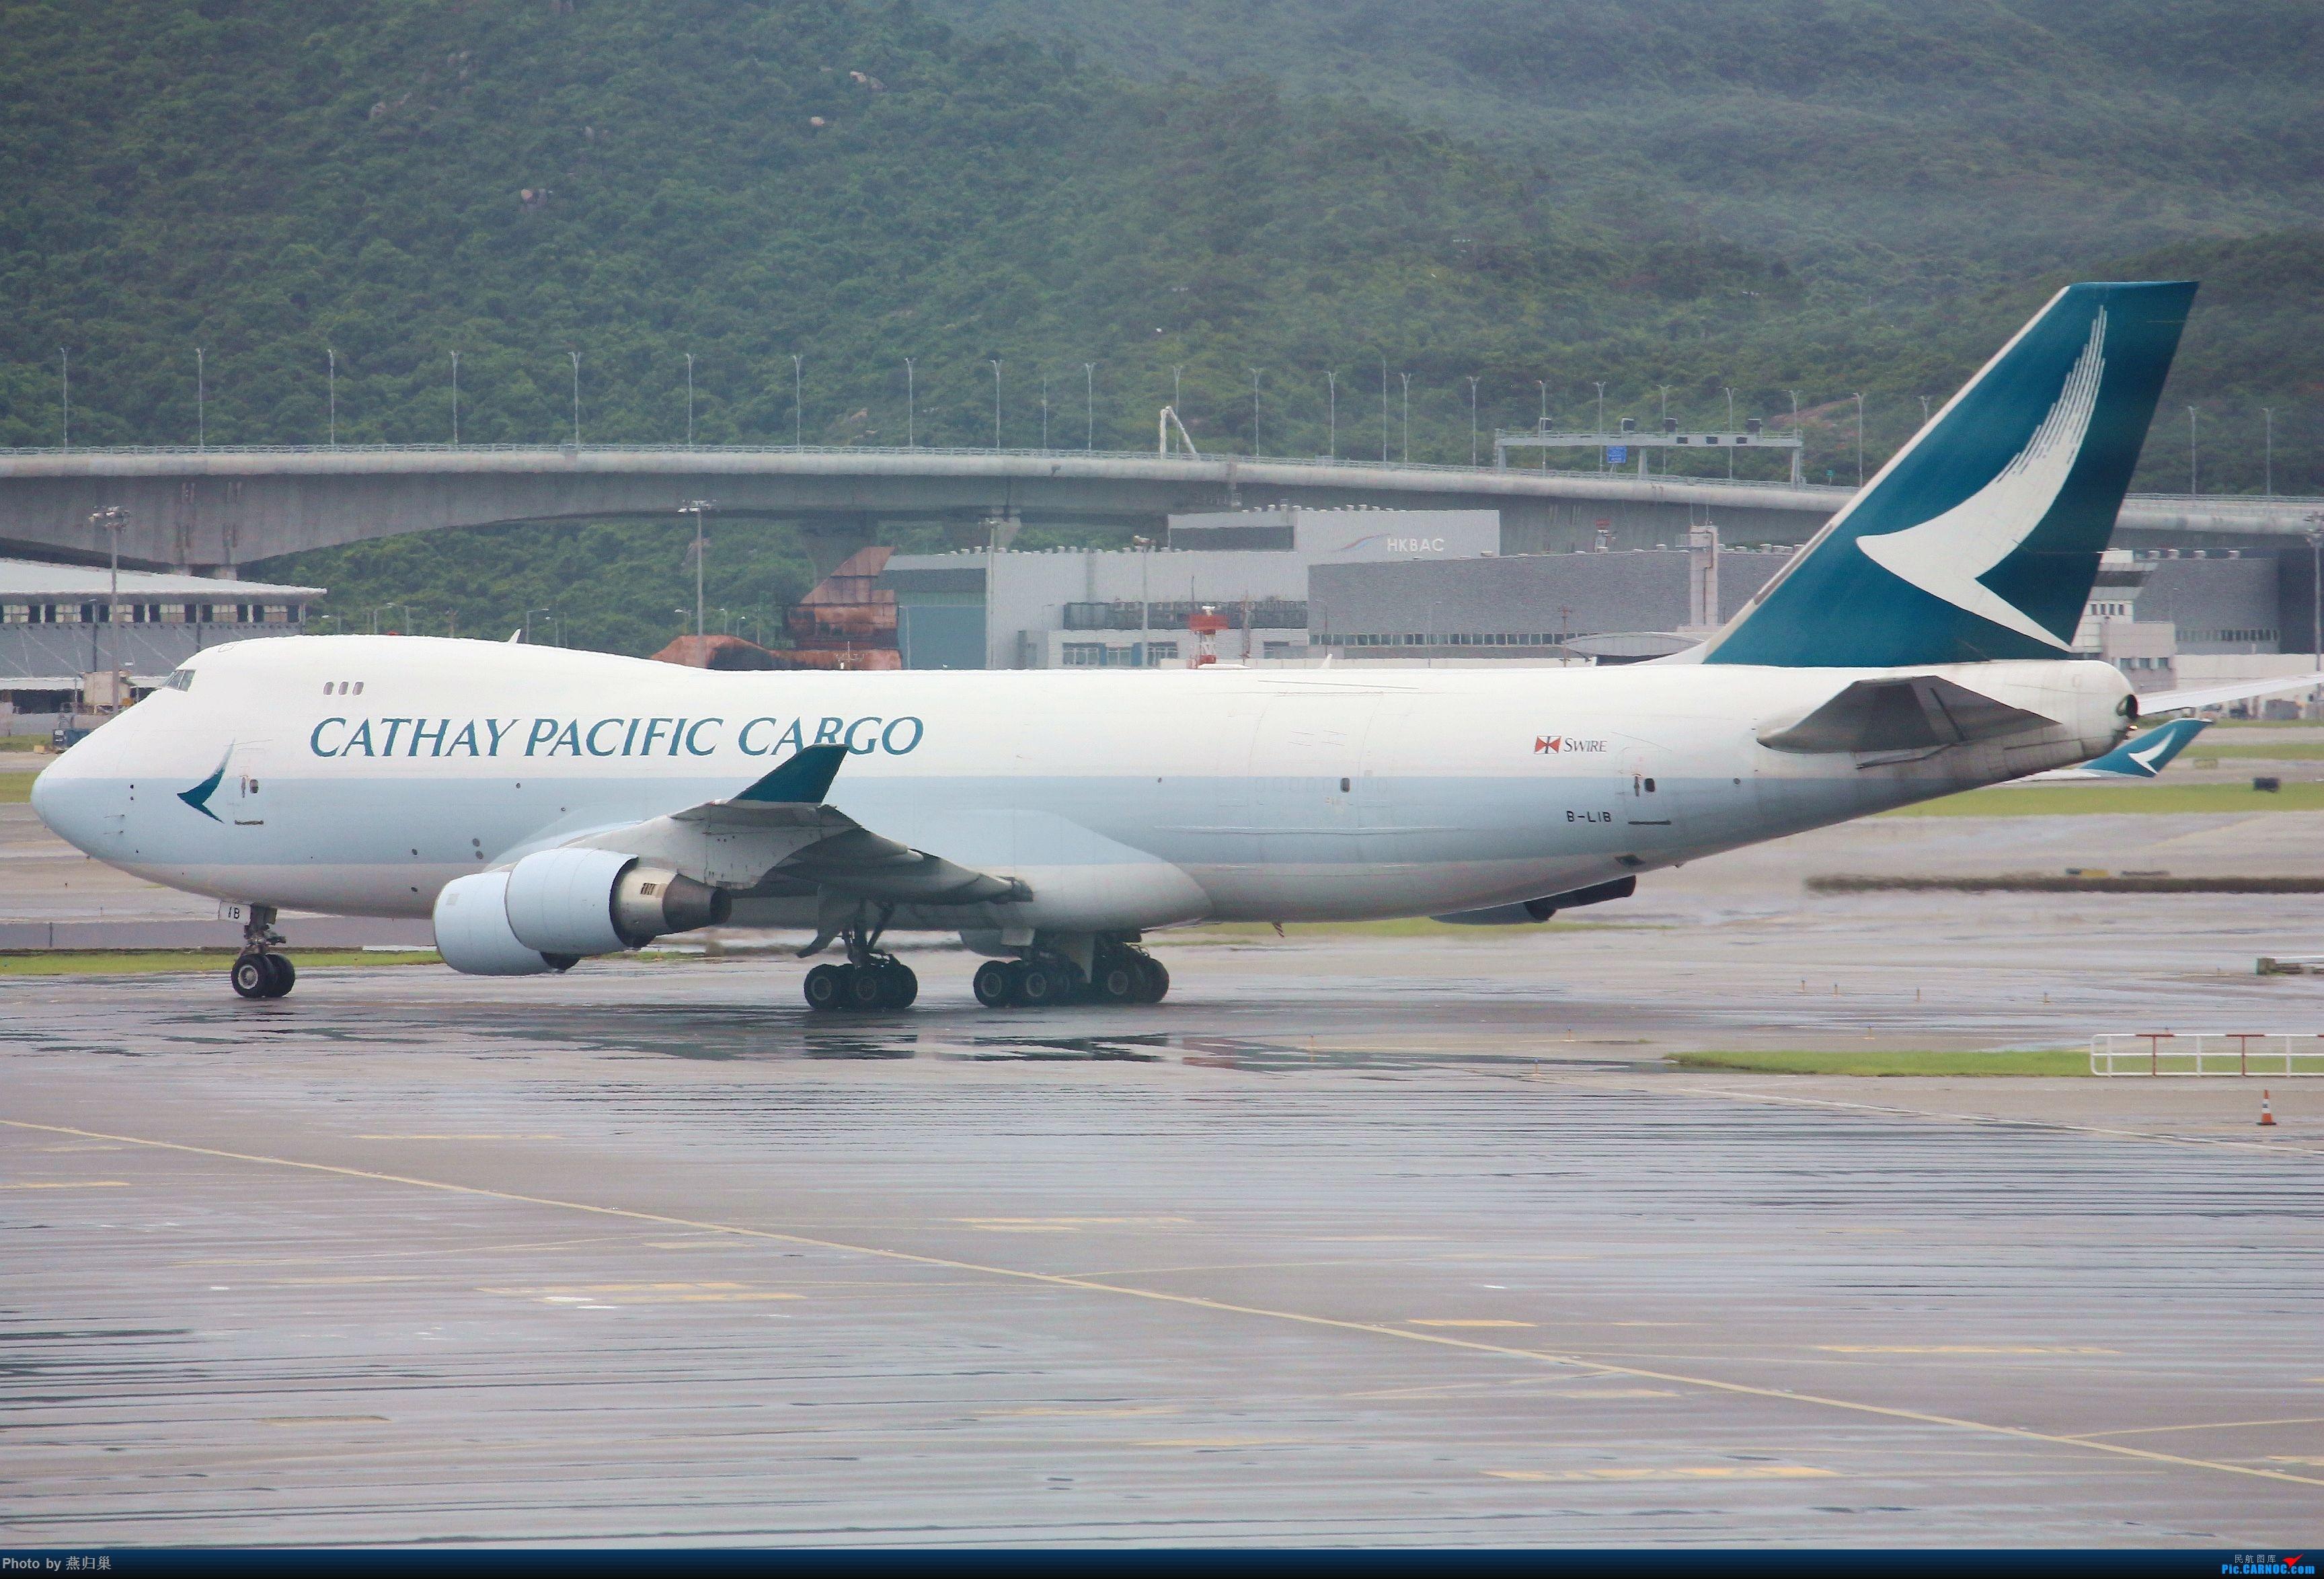 Re:[原创]【HKG】七月香港拍机合集 BOEING 747-400 B-LIB 中国香港国际机场